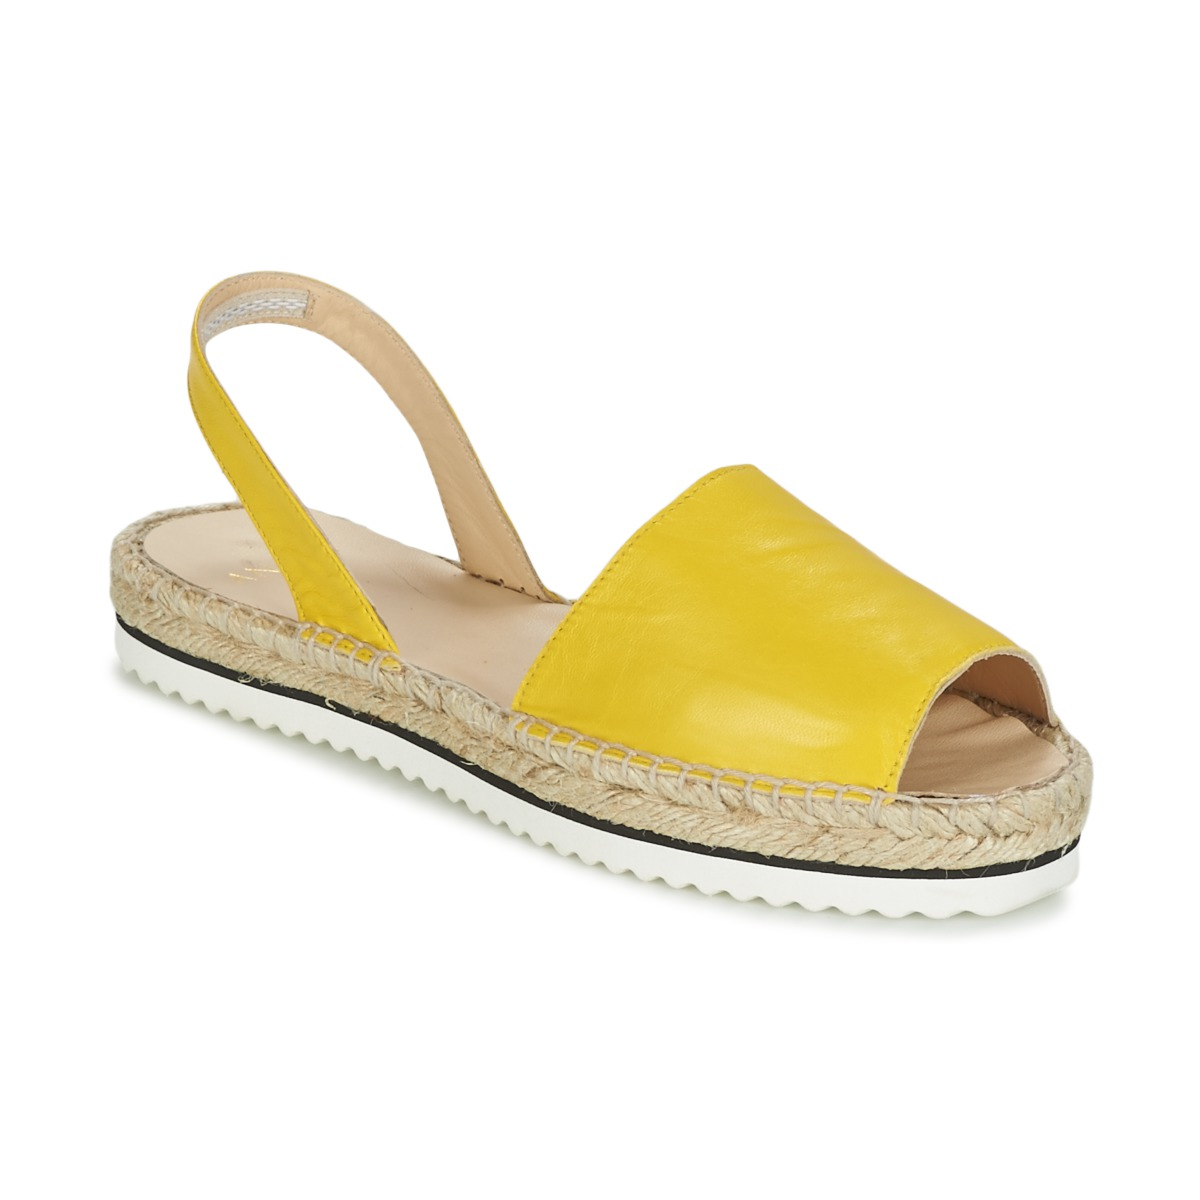 Sandale Anaki TEQUILAI Jaune